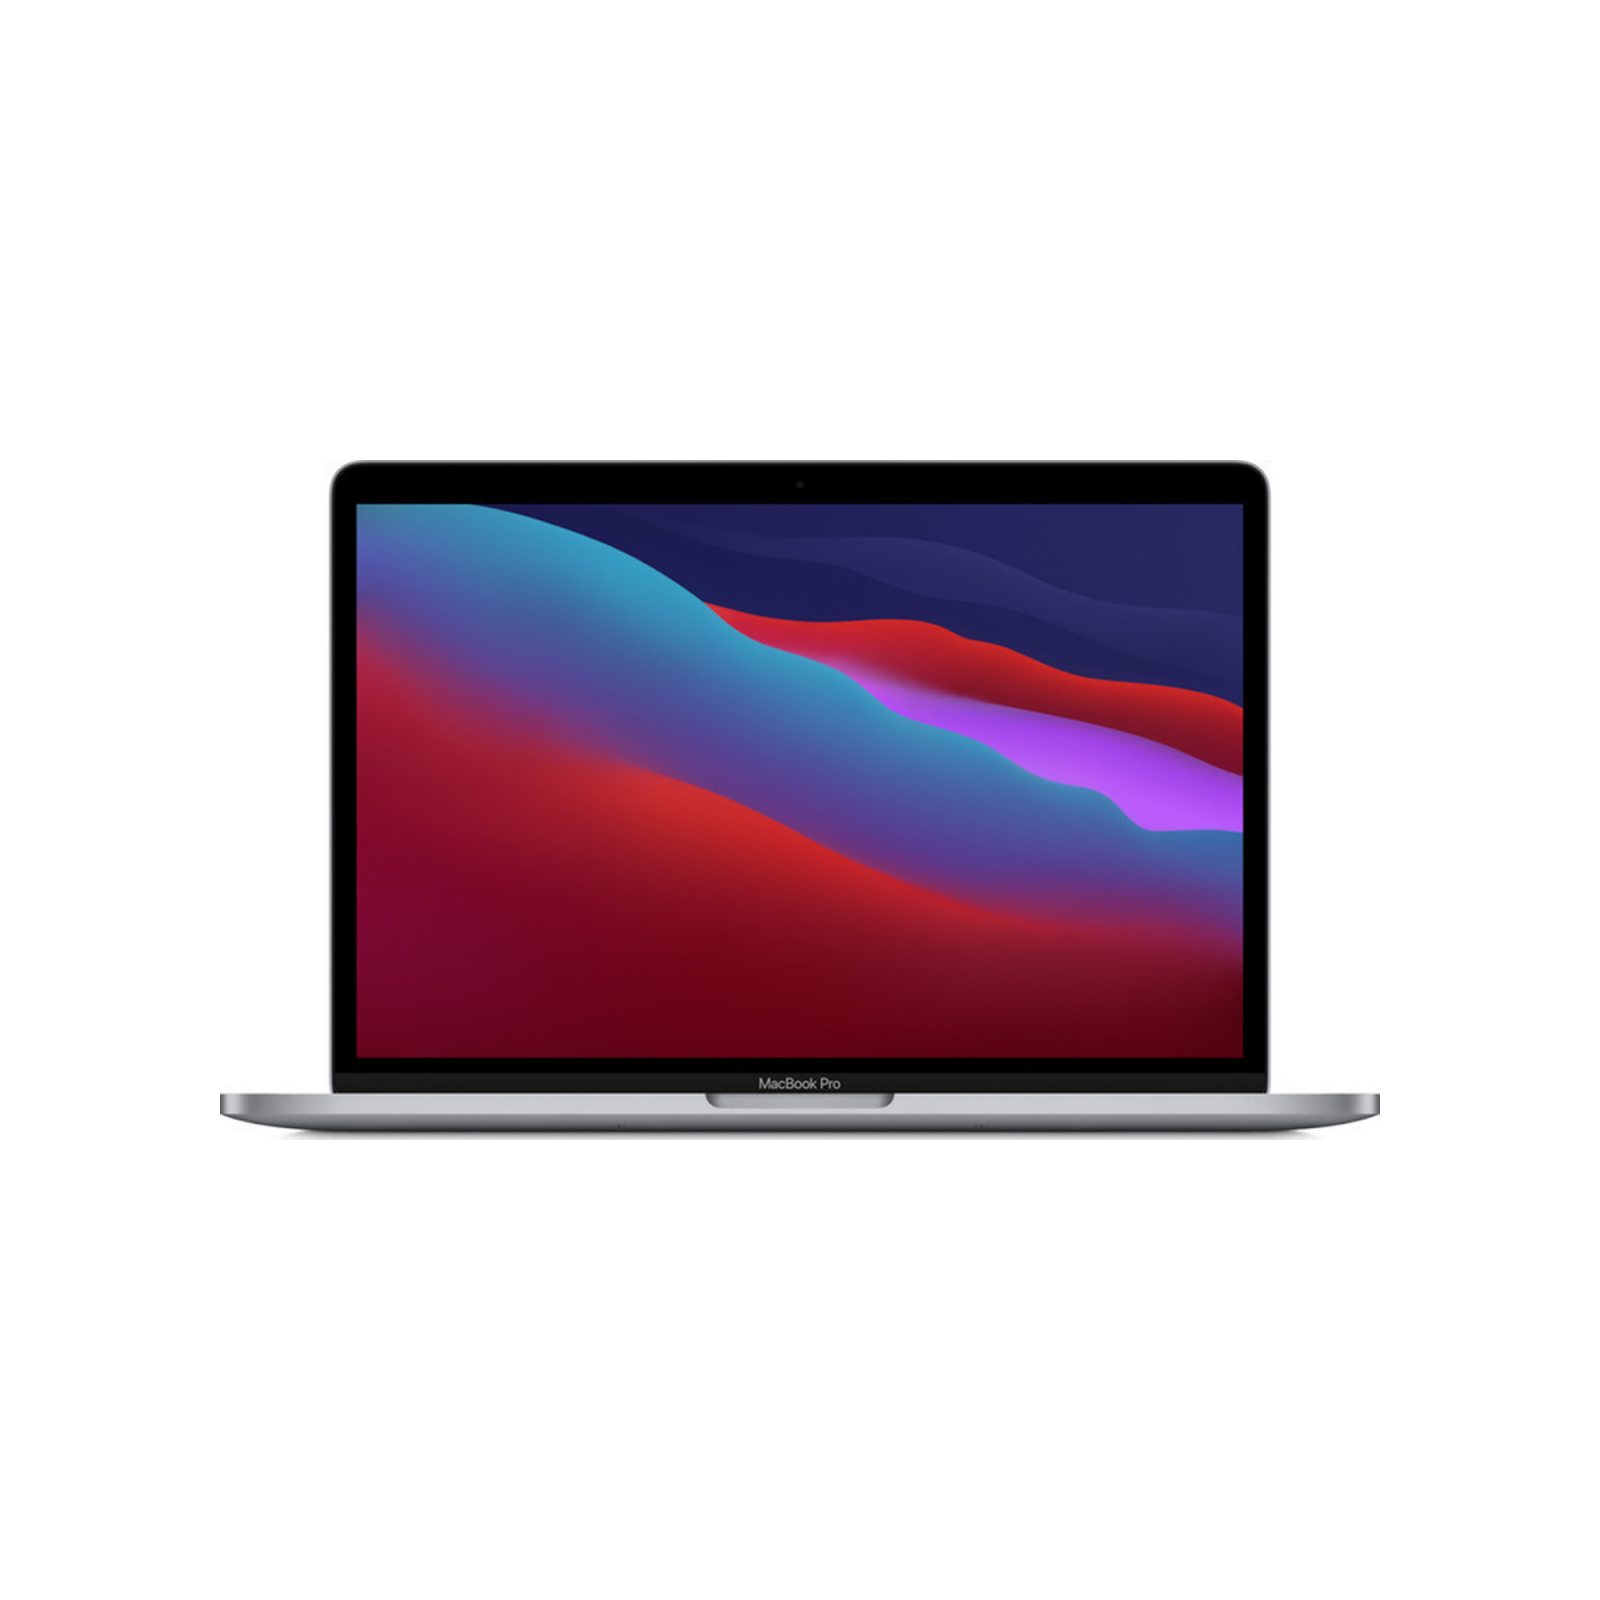 Apple MacBook Pro 13 M1 8-Core/8GB/256GB/8-Core GPU Space Gray Laptop